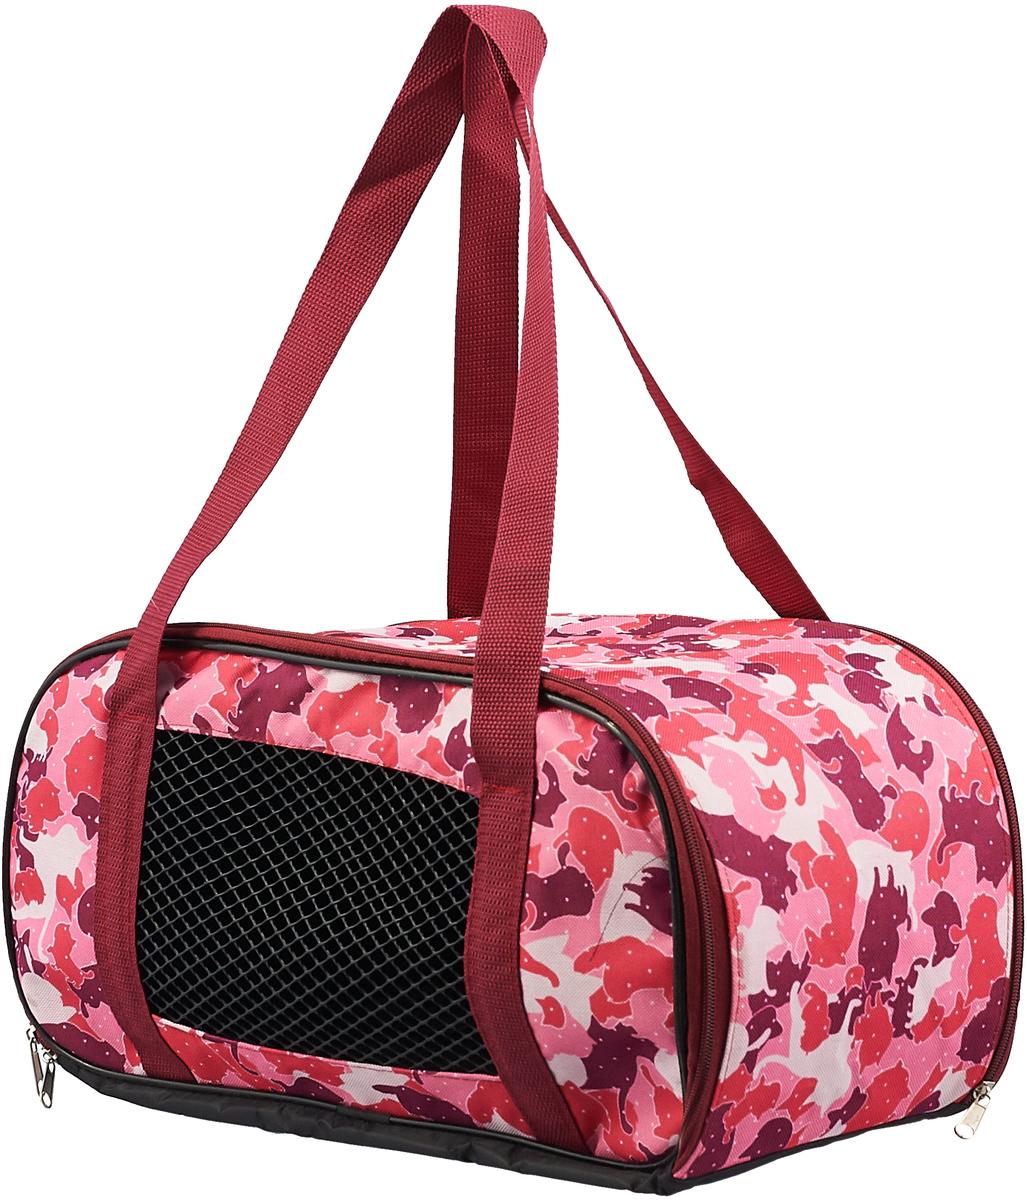 Сумка-переноска для животных Теремок, цвет: красный, розовый, 44 х 19 х 20 см переноска для животных fauna explorer sport цвет розовый серый 57 х 38 х 38 см